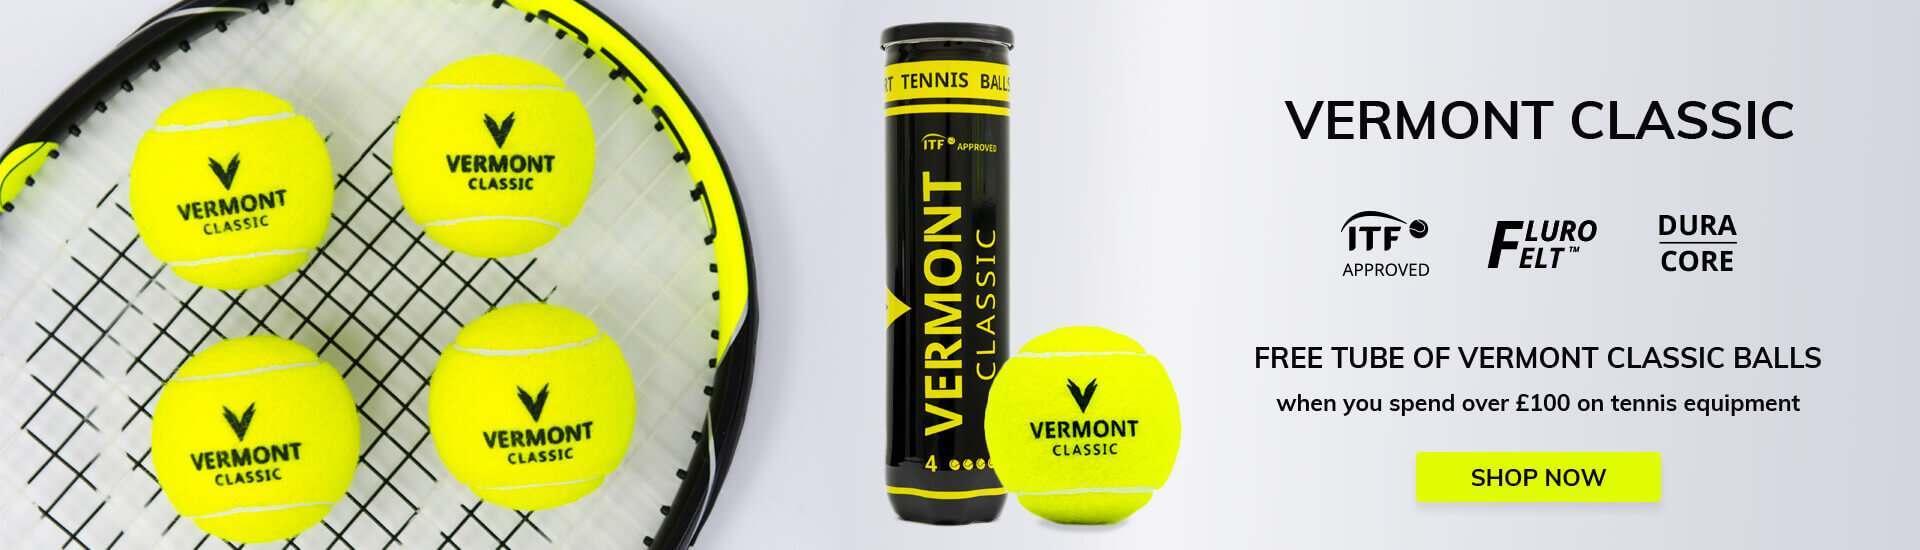 Vermont Classic Balls